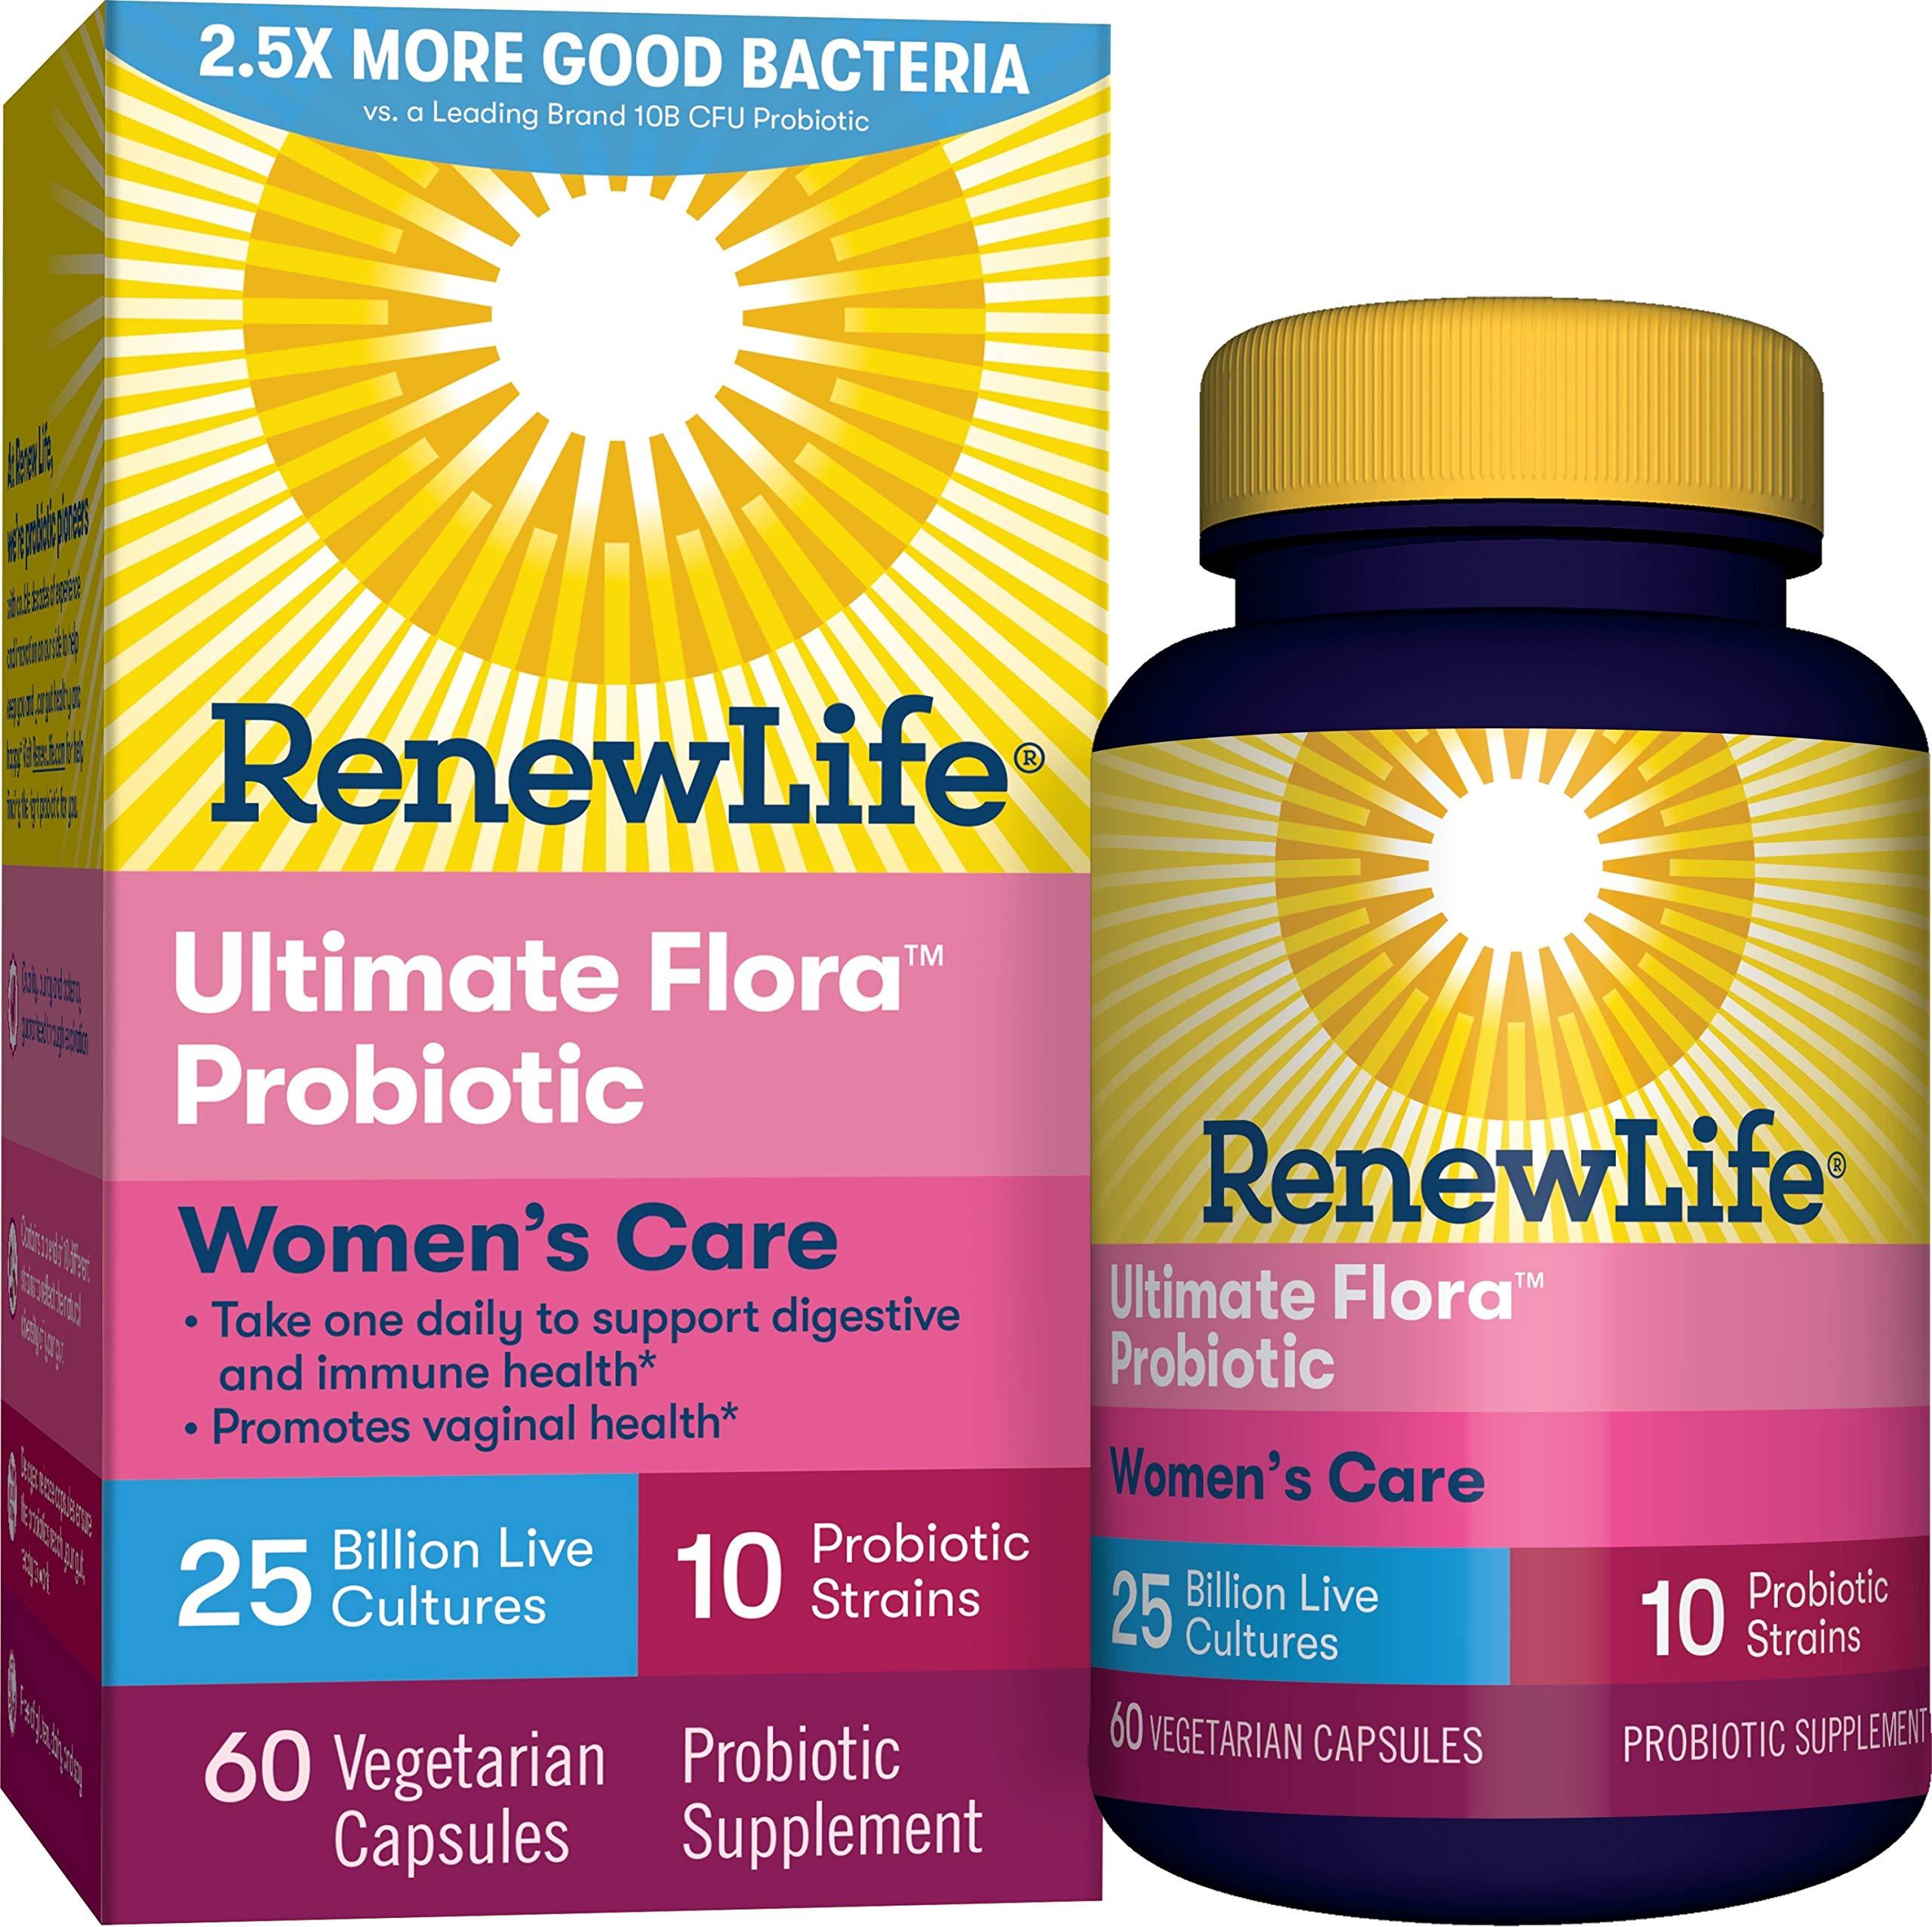 Renew Life #1 Women's Probiotic - Ultimate Flora Women's Care Shelf Stable Probiotic Supplement - Gluten, Dairy & Soy Free - 25 Billion CFU - 60 Vegetarian Capsules by Renew Life